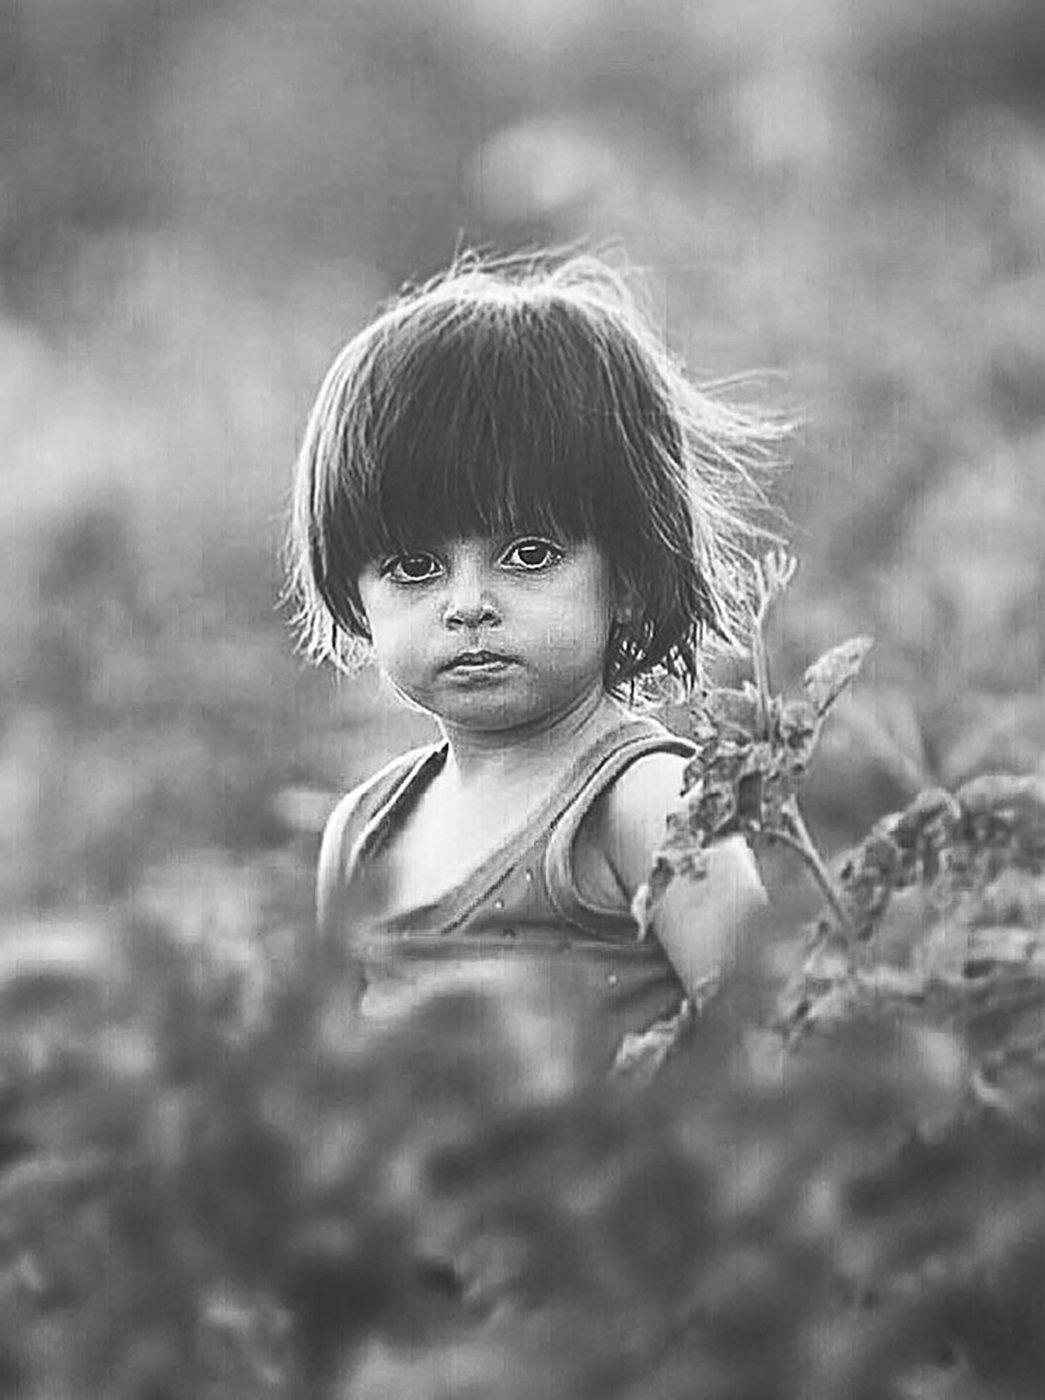 #man #cloudly #bnw #fine_art #sky #cloud #mehrzad_photo #hossein_mehrzad #black_and_white #b&w #editing #photoshop #creative #photo_art #digital #mehrzad #photography #creative_art #consept_art #freedom #woman #blood #pesonal #crush #portrait #child #girl, Hossein Mehrzad